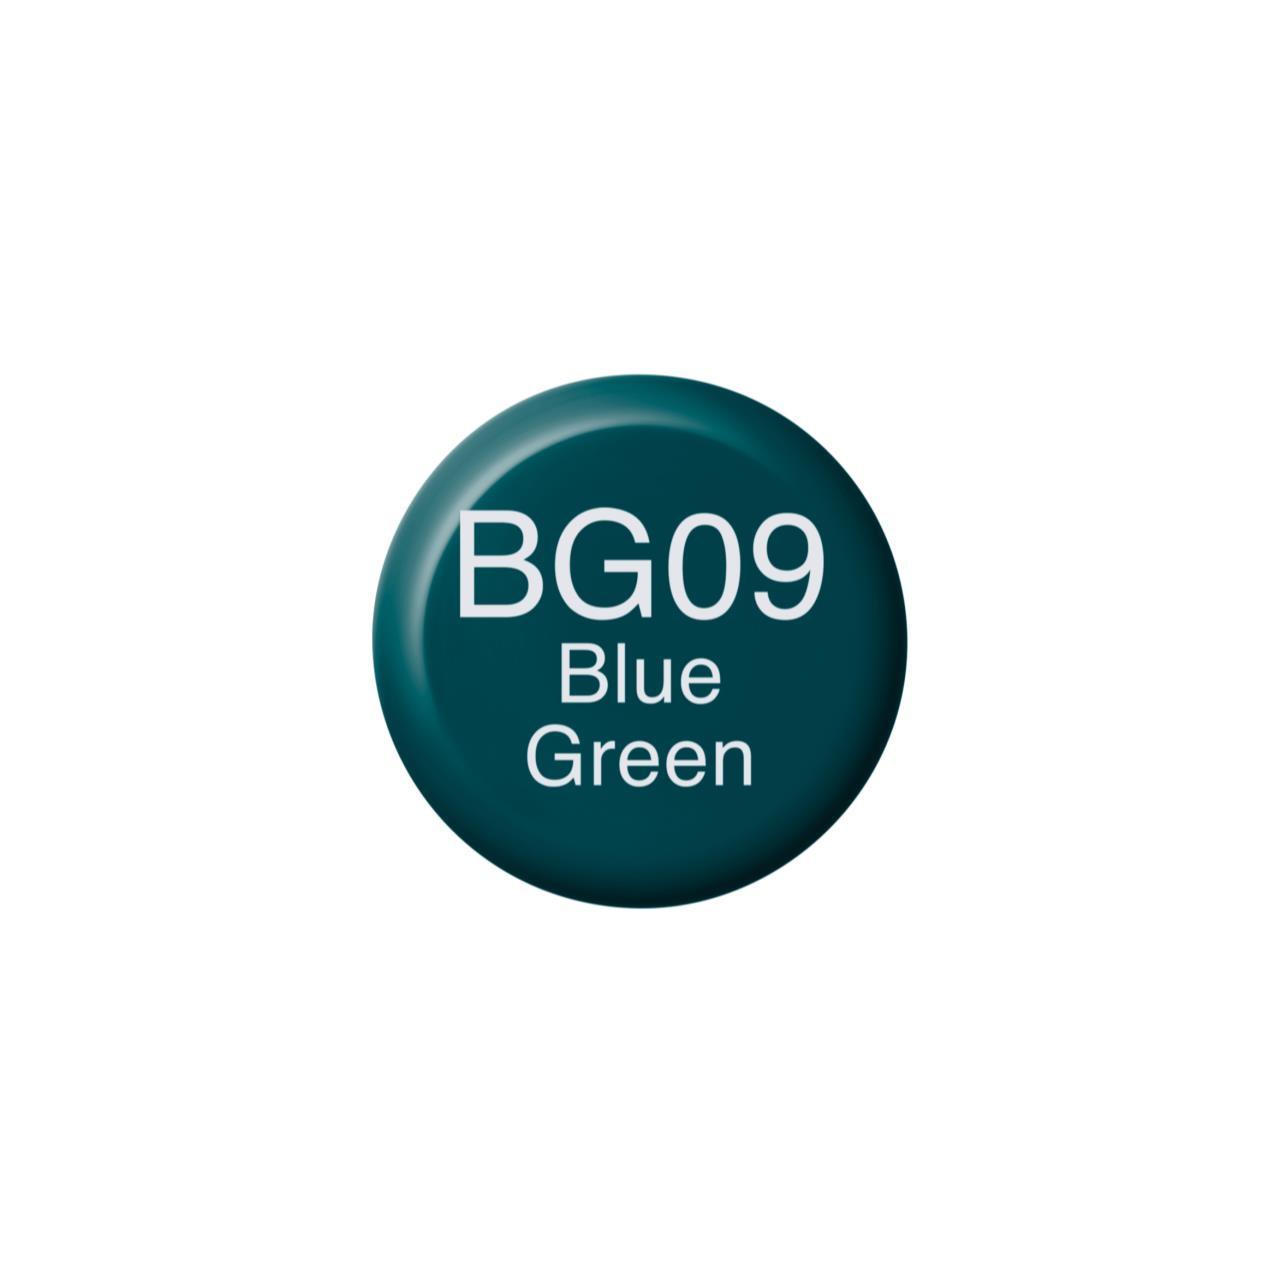 BG09 Blue Green, Copic Ink - 4511338056219